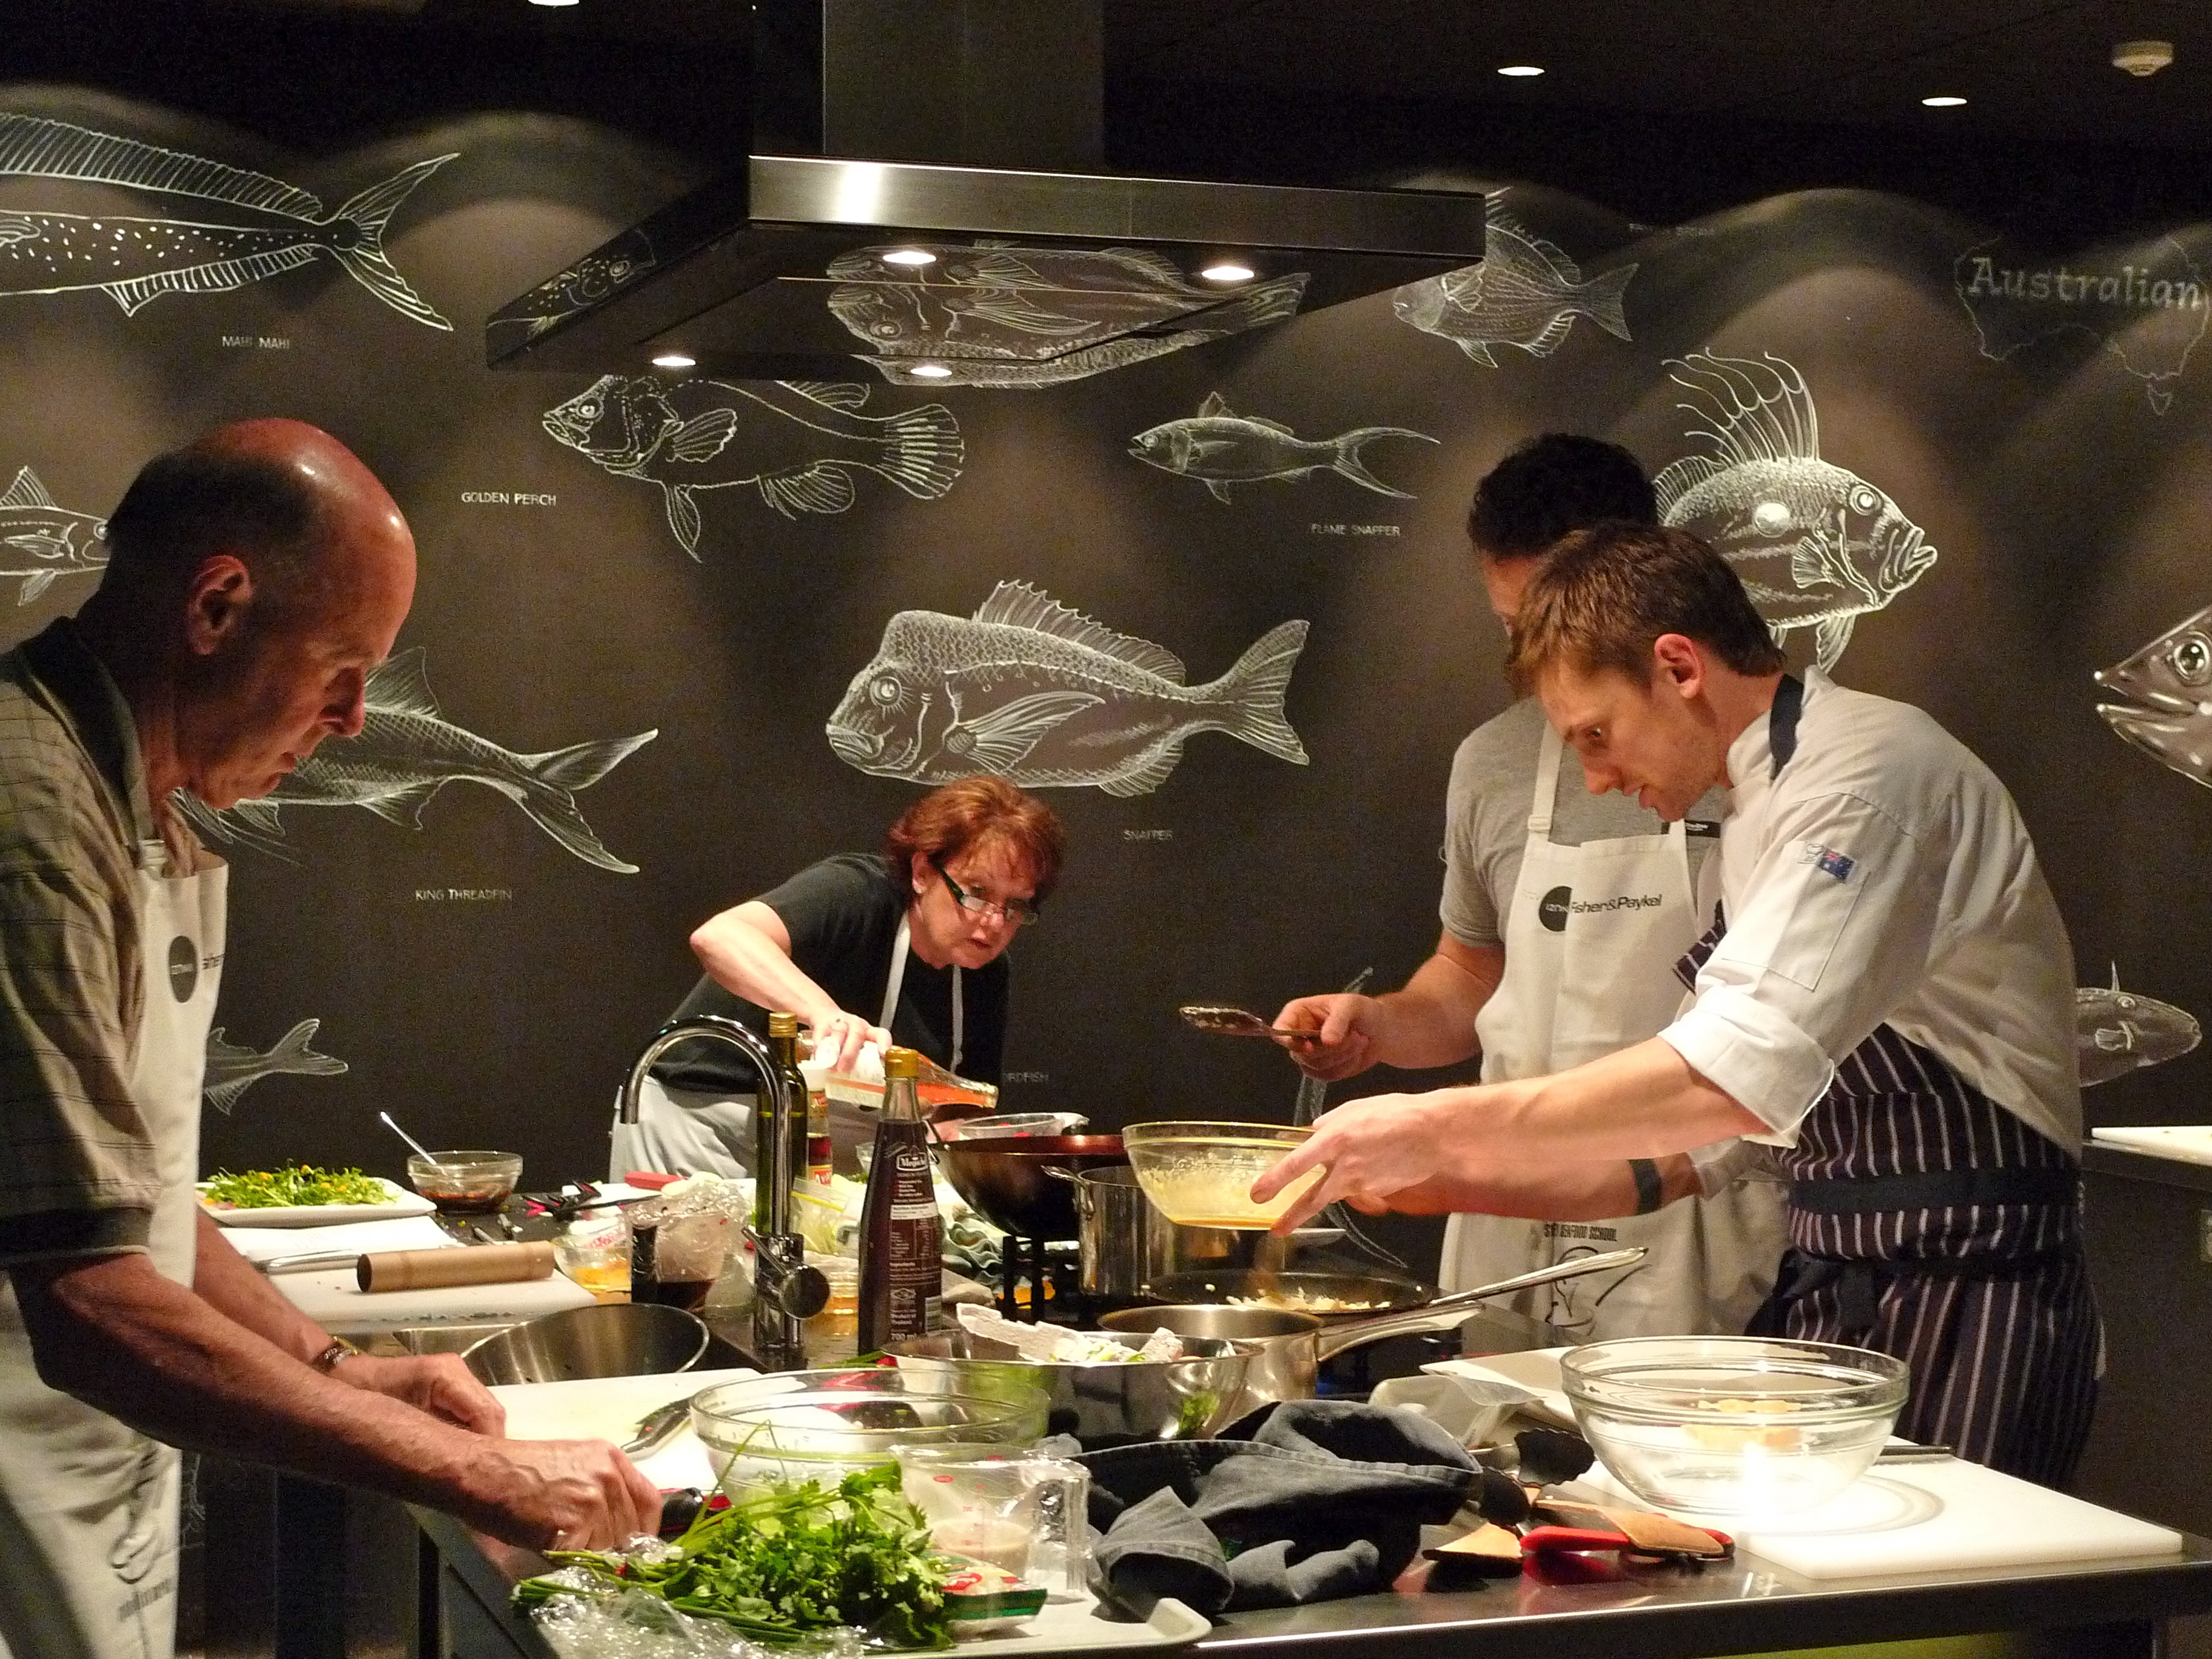 Culinary Arts university of art sydney